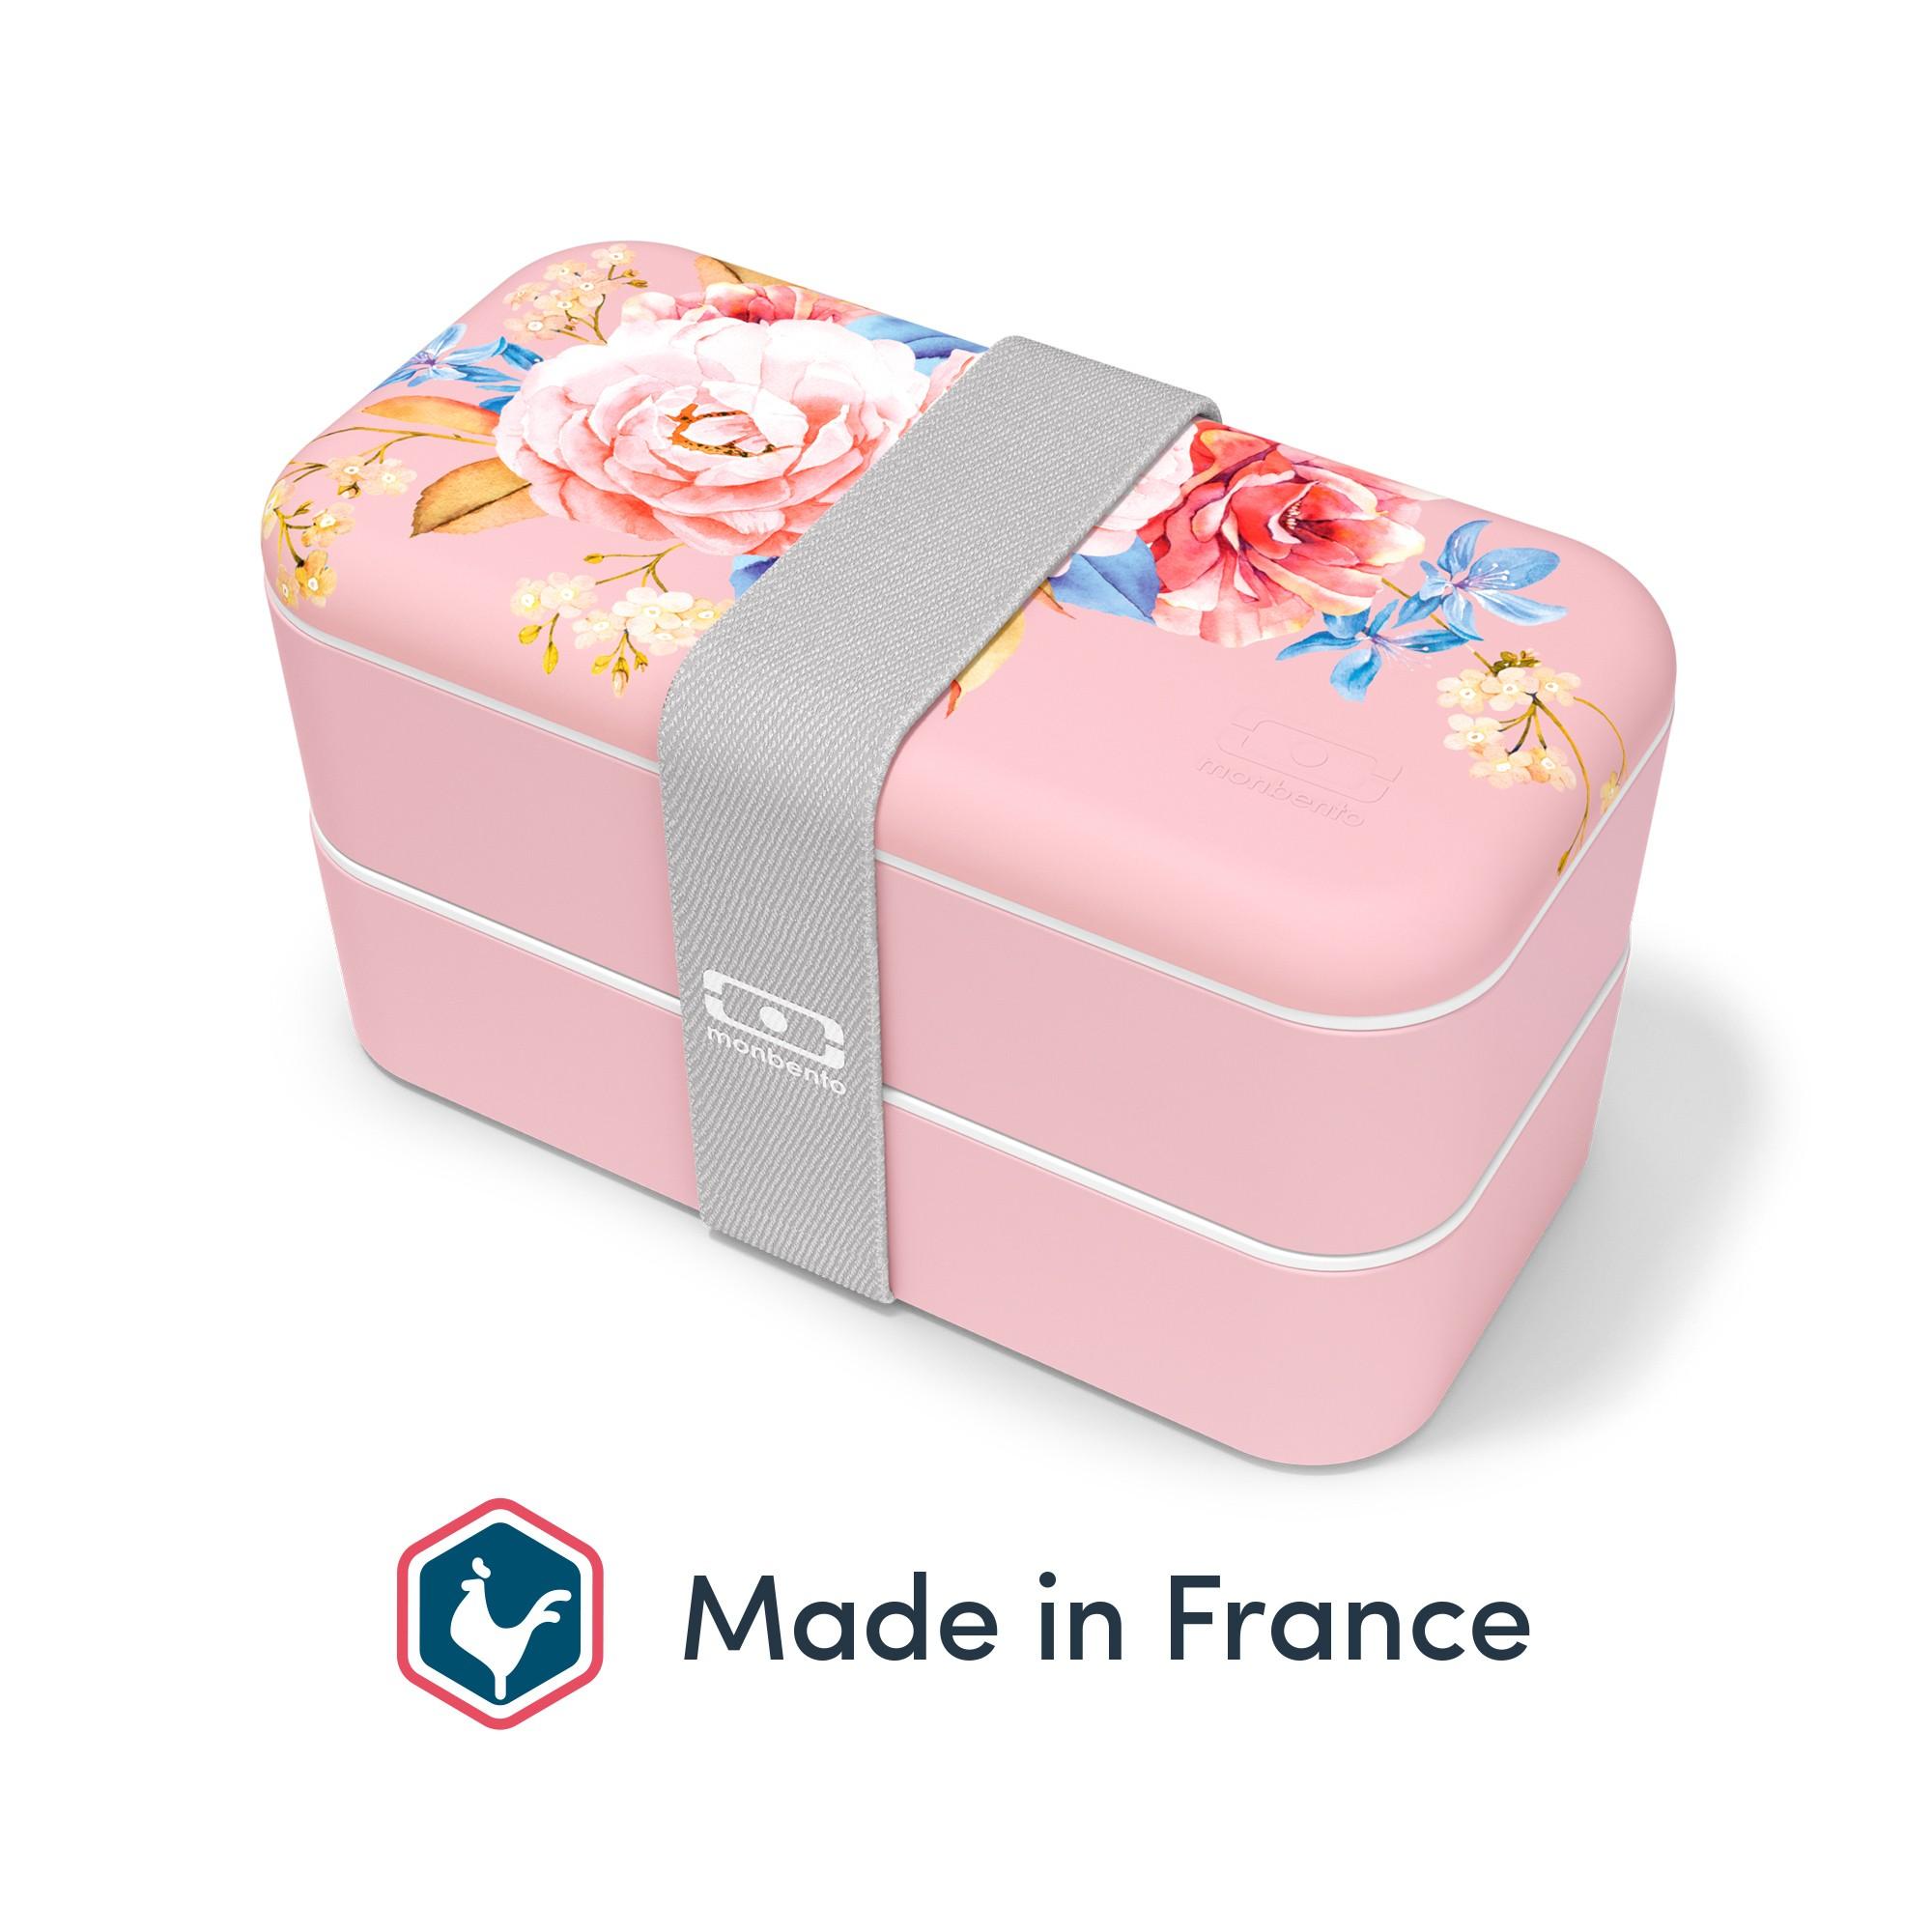 Ланч-бокс Monbento Original made in France Porcelaine Flower (1000 11 120)